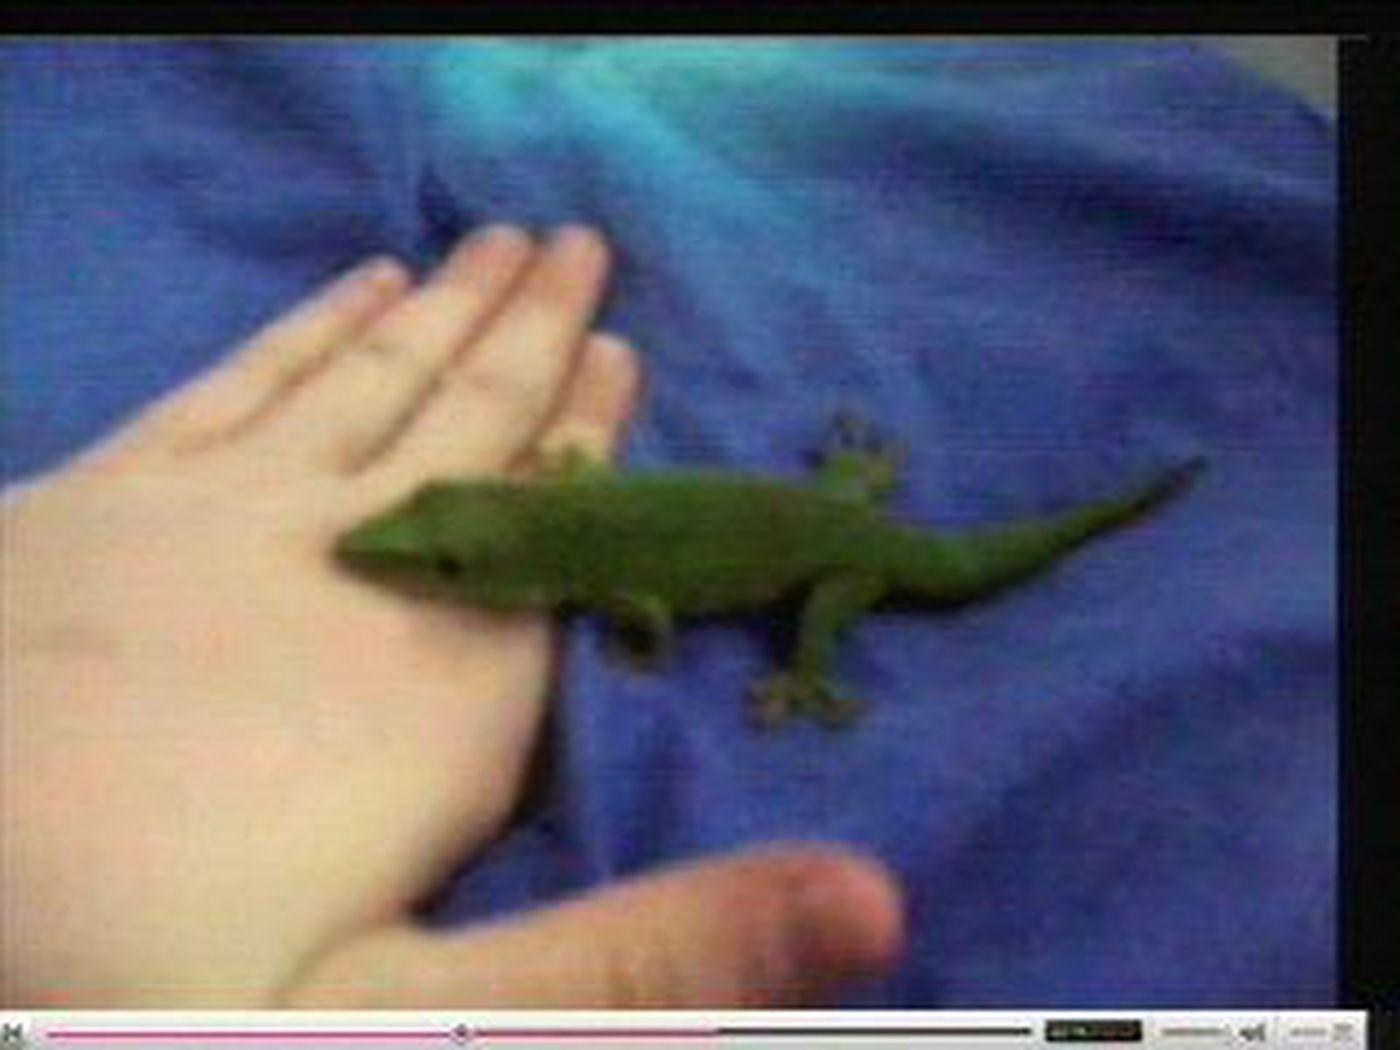 Beware, Madagascar Giant Day Gecko Bites!